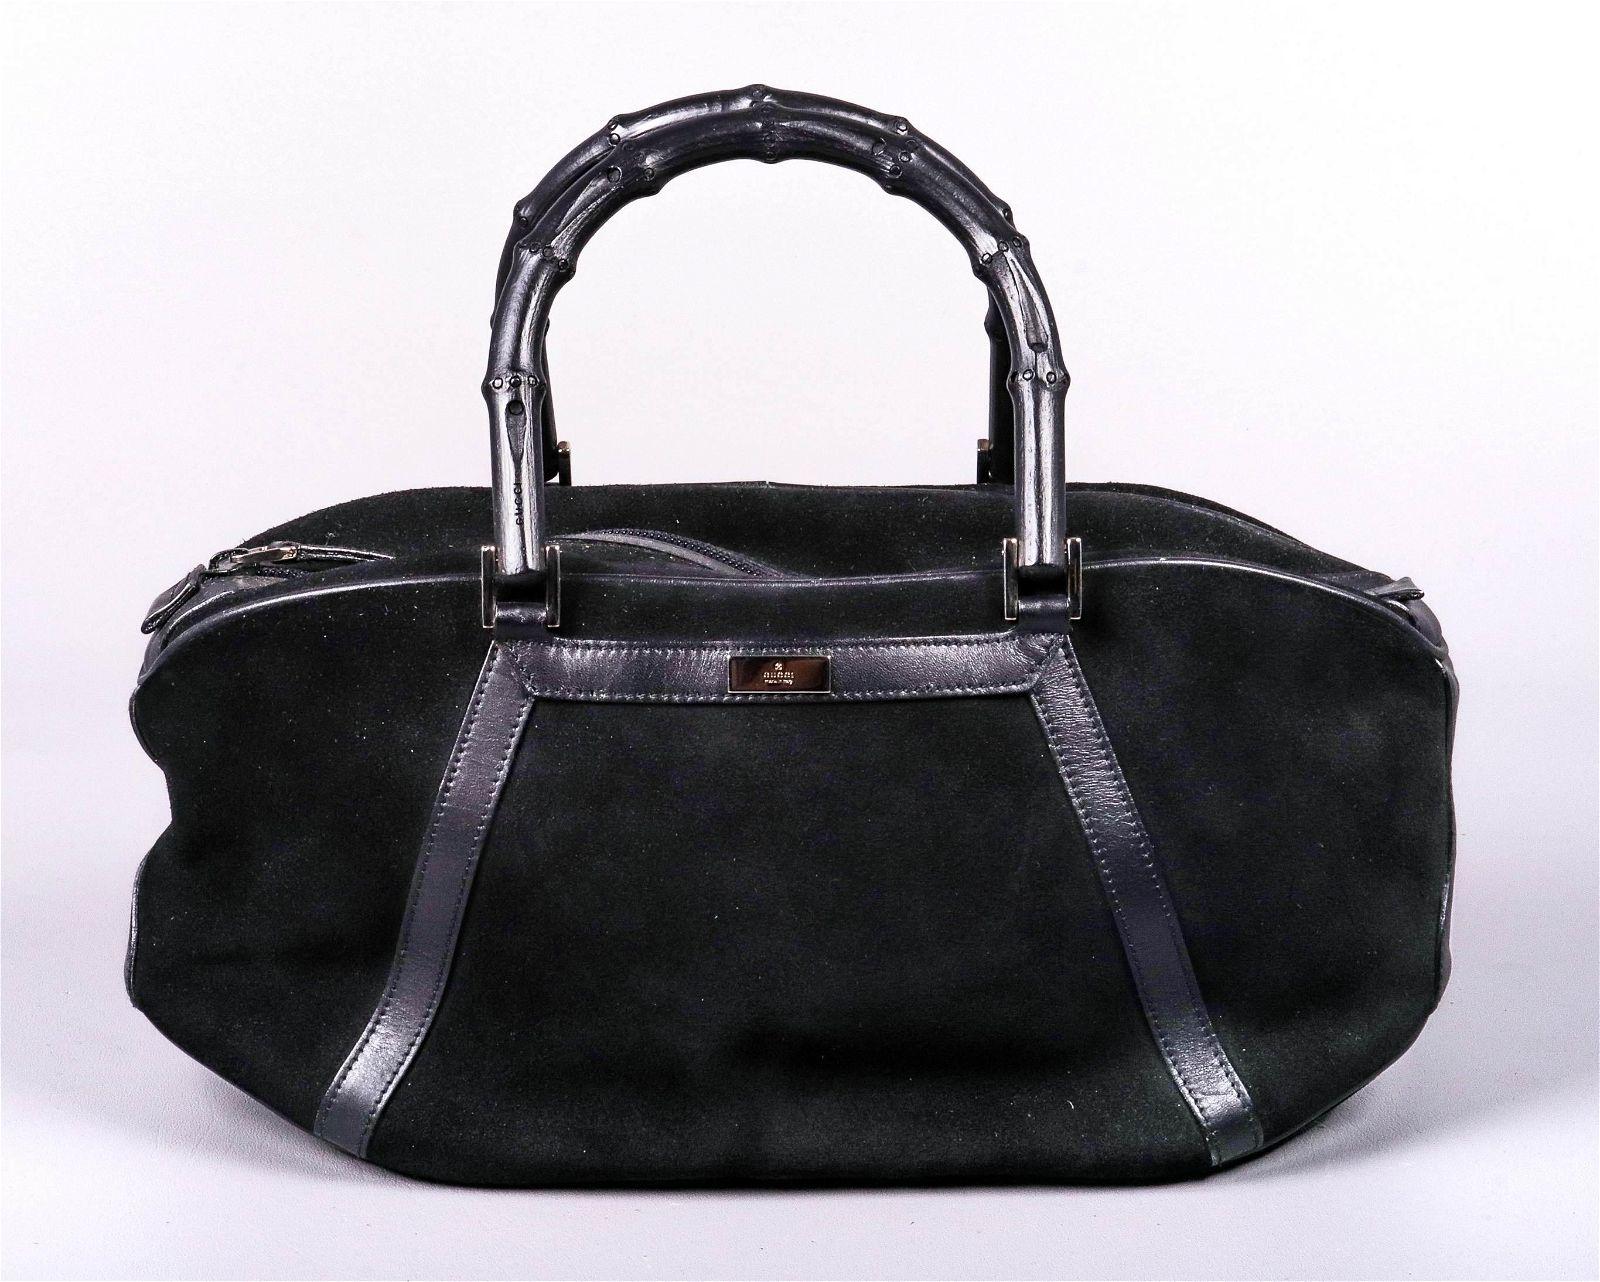 Vintage Gucci Black Suede Bamboo Handled Bag